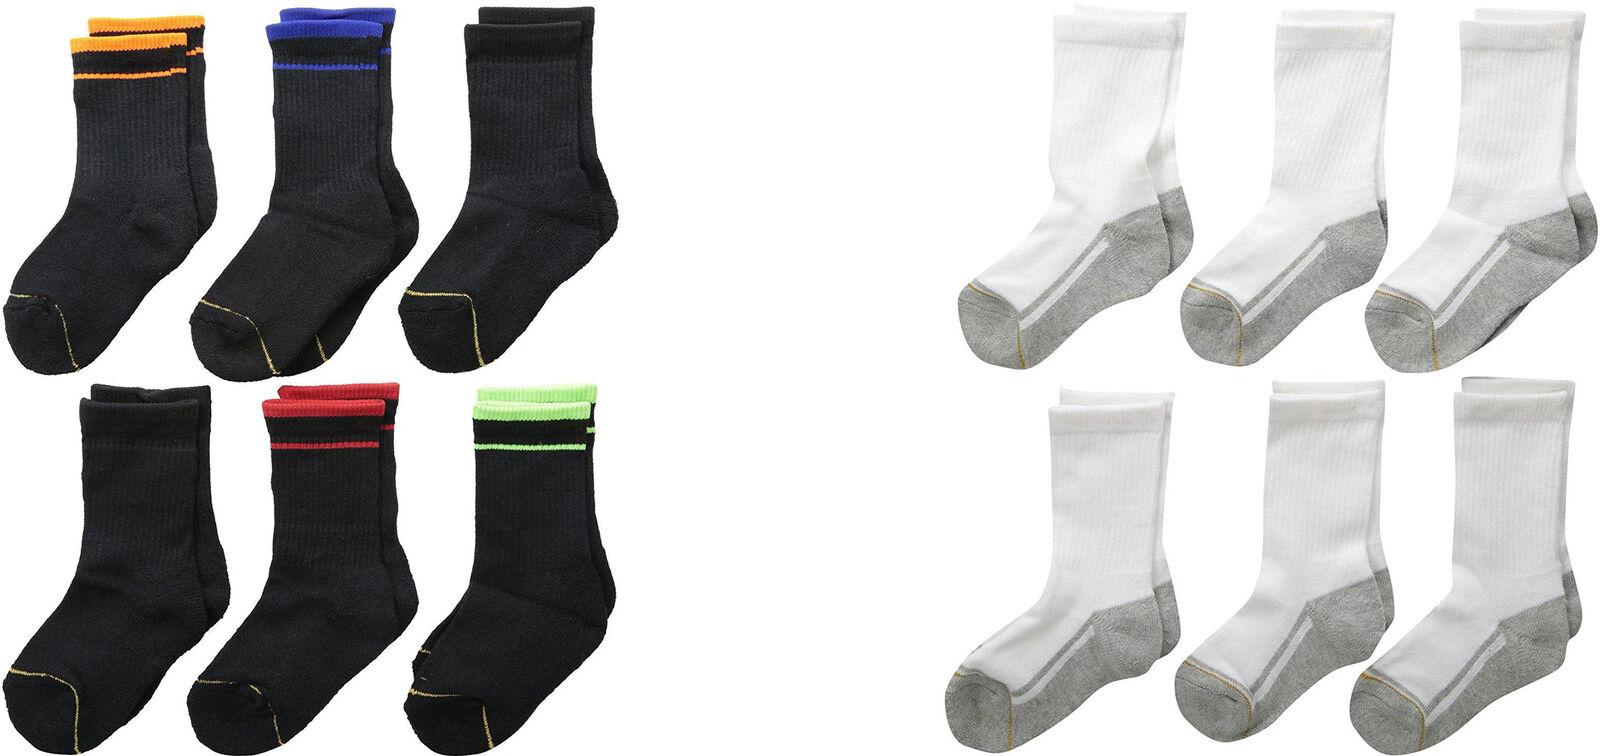 Gold Toe Big Boys' Athletic Crew Socks, Assorted Colors, 6 Pairs | eBay